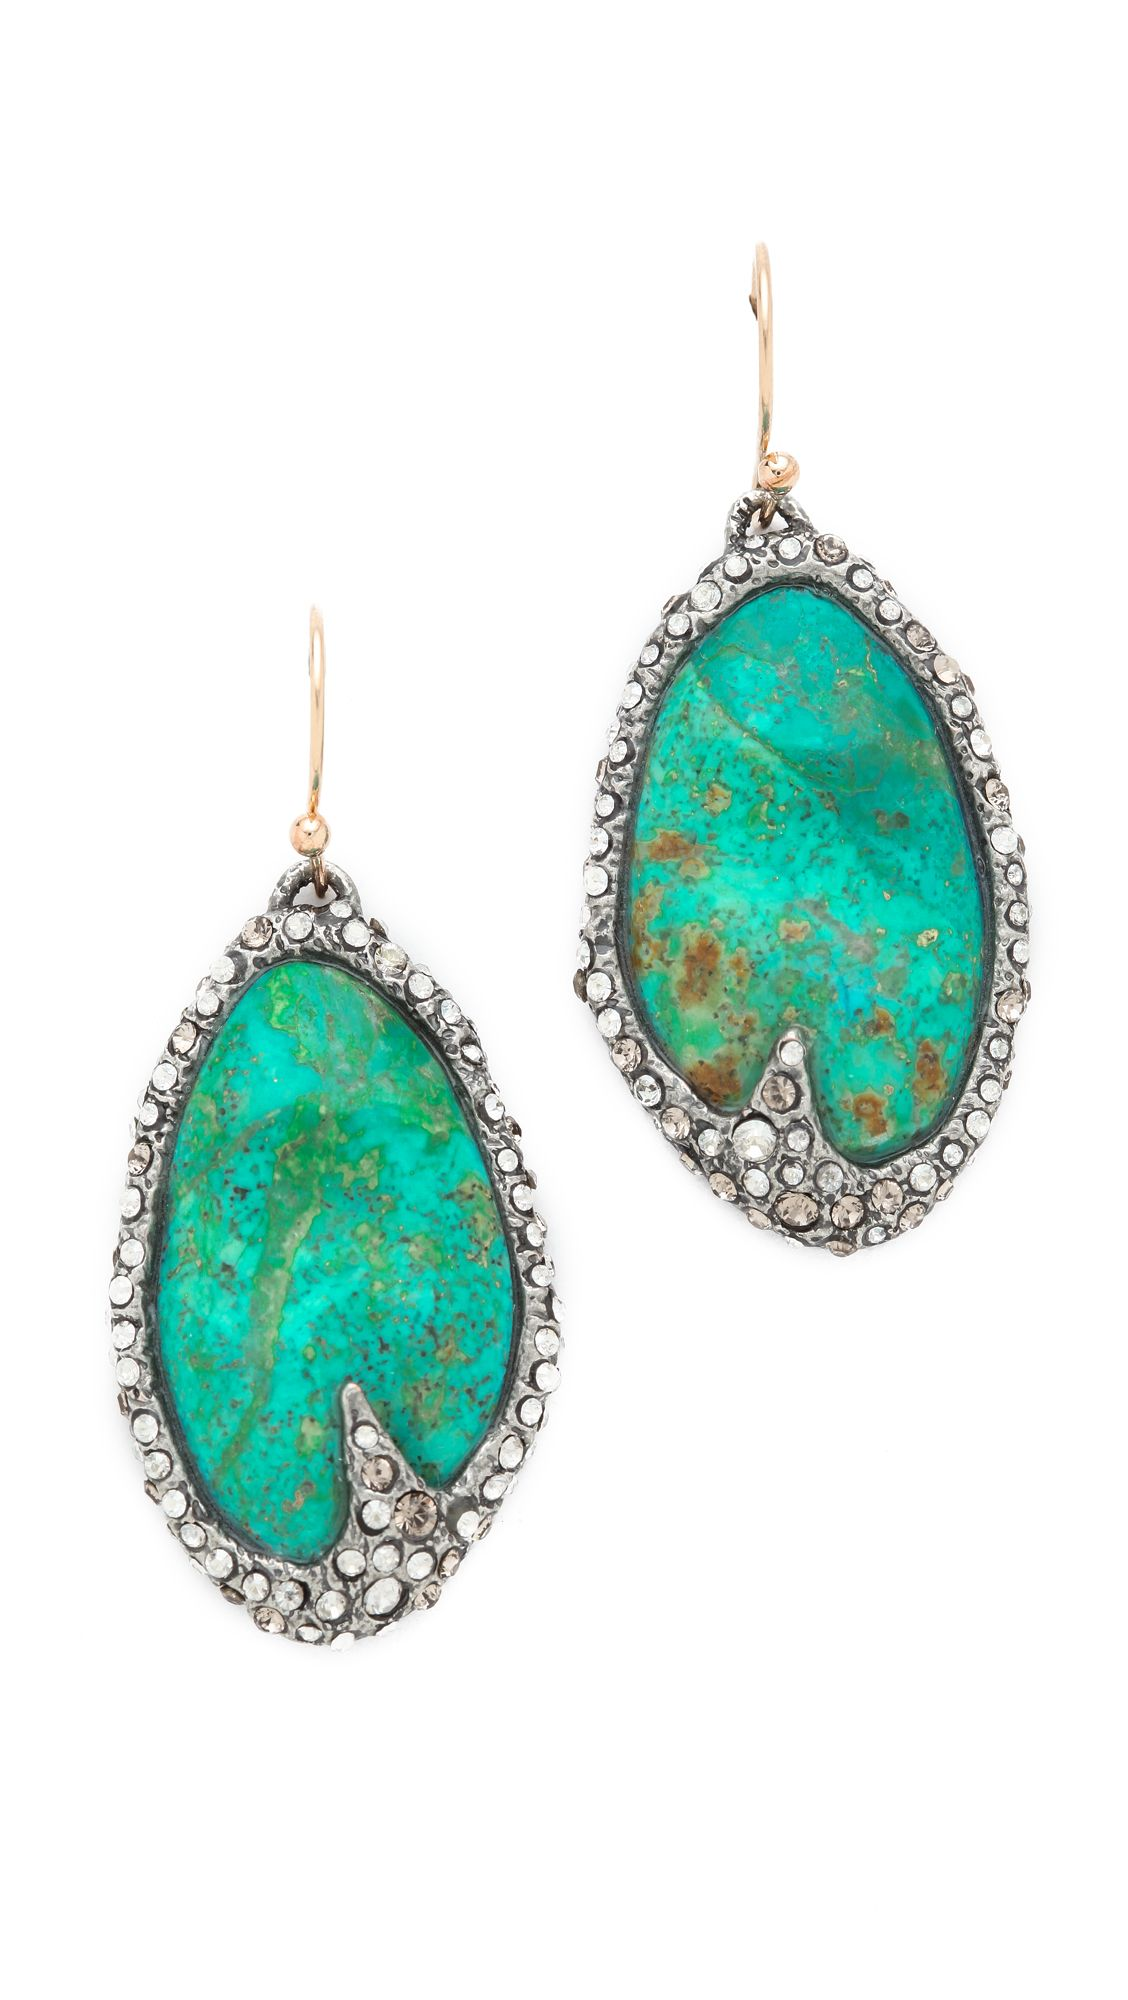 Alexis Bittar Earrings Blue Cordova Chrysocolla Jewelry